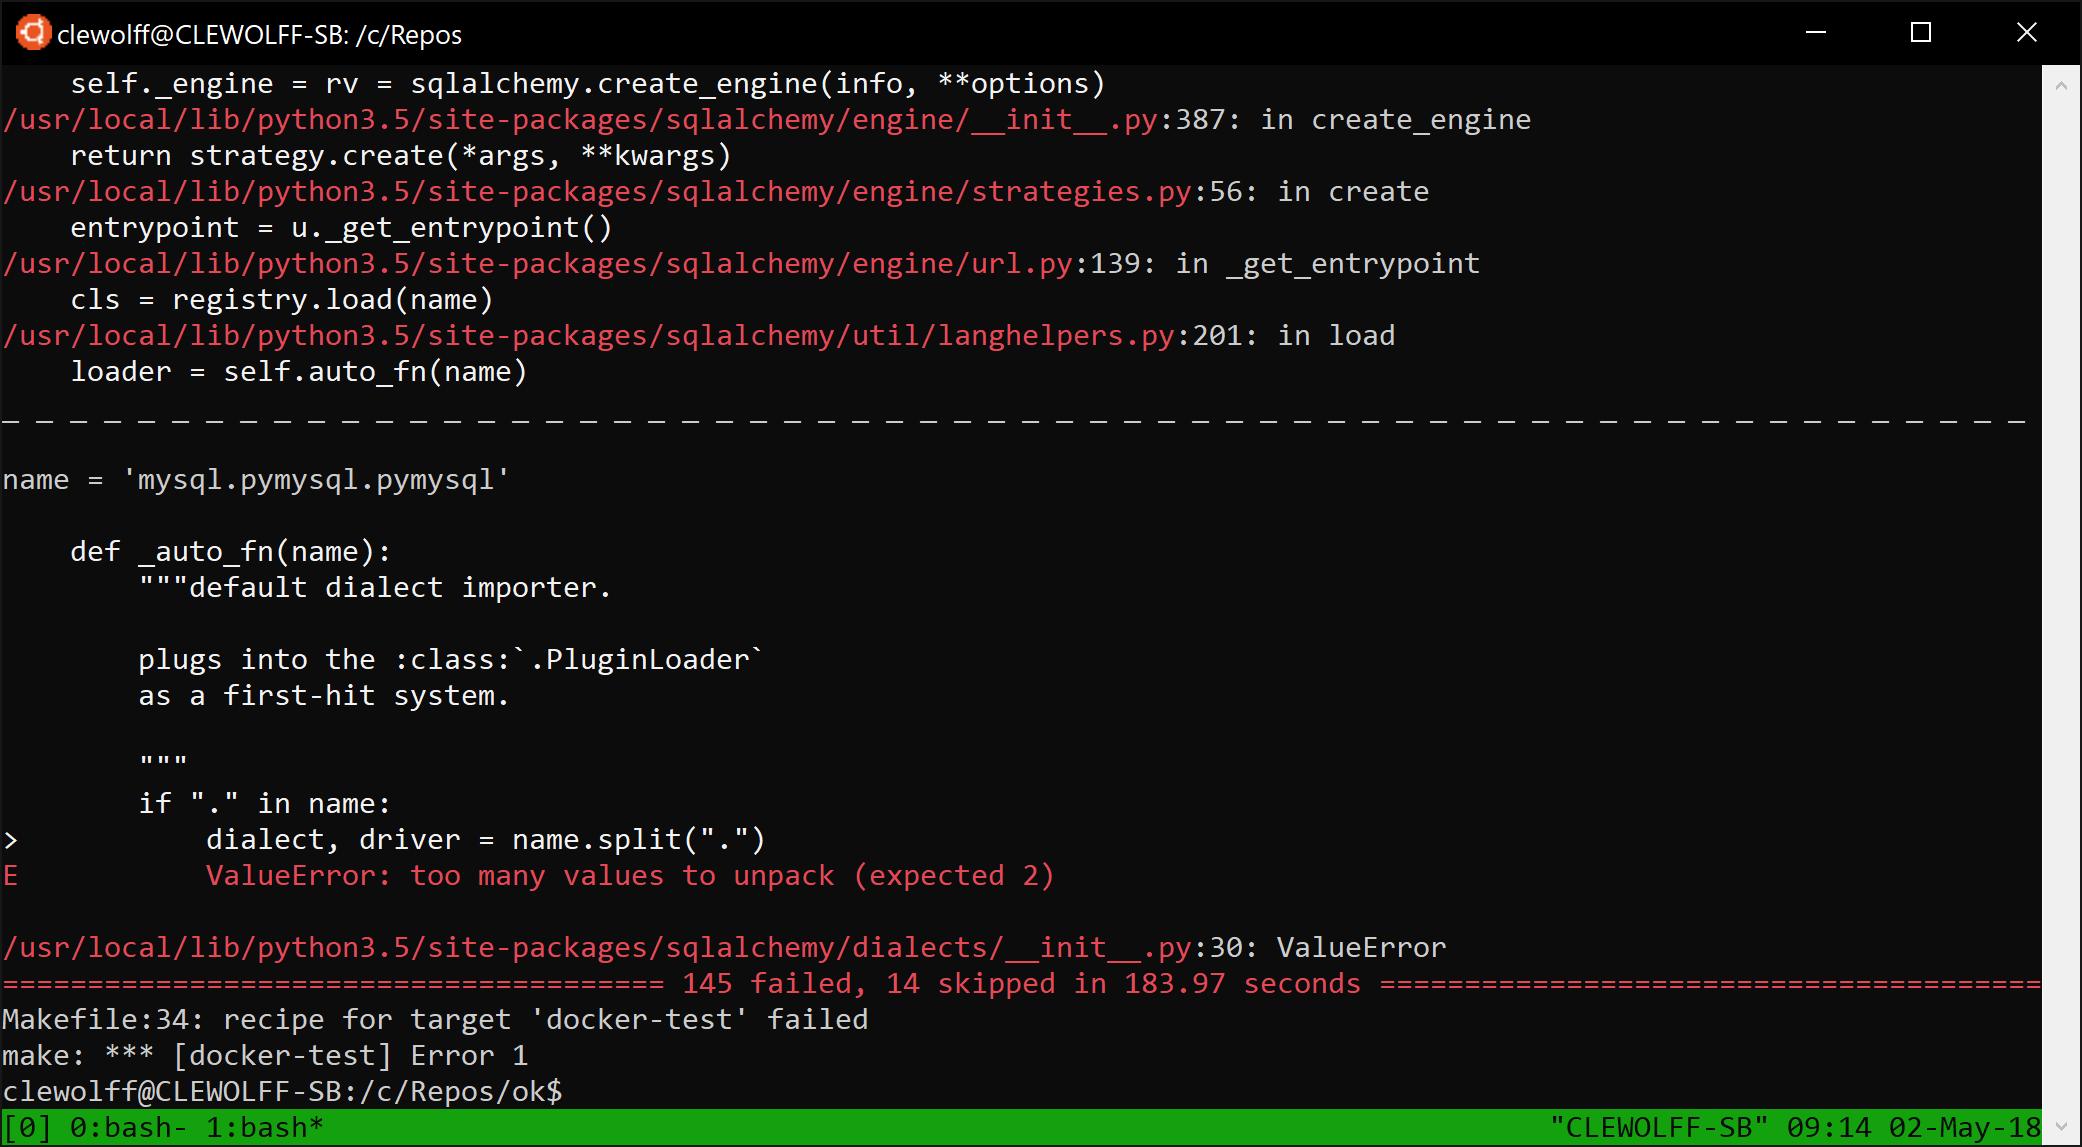 Screenshot of makefile recipe for docker test run failure